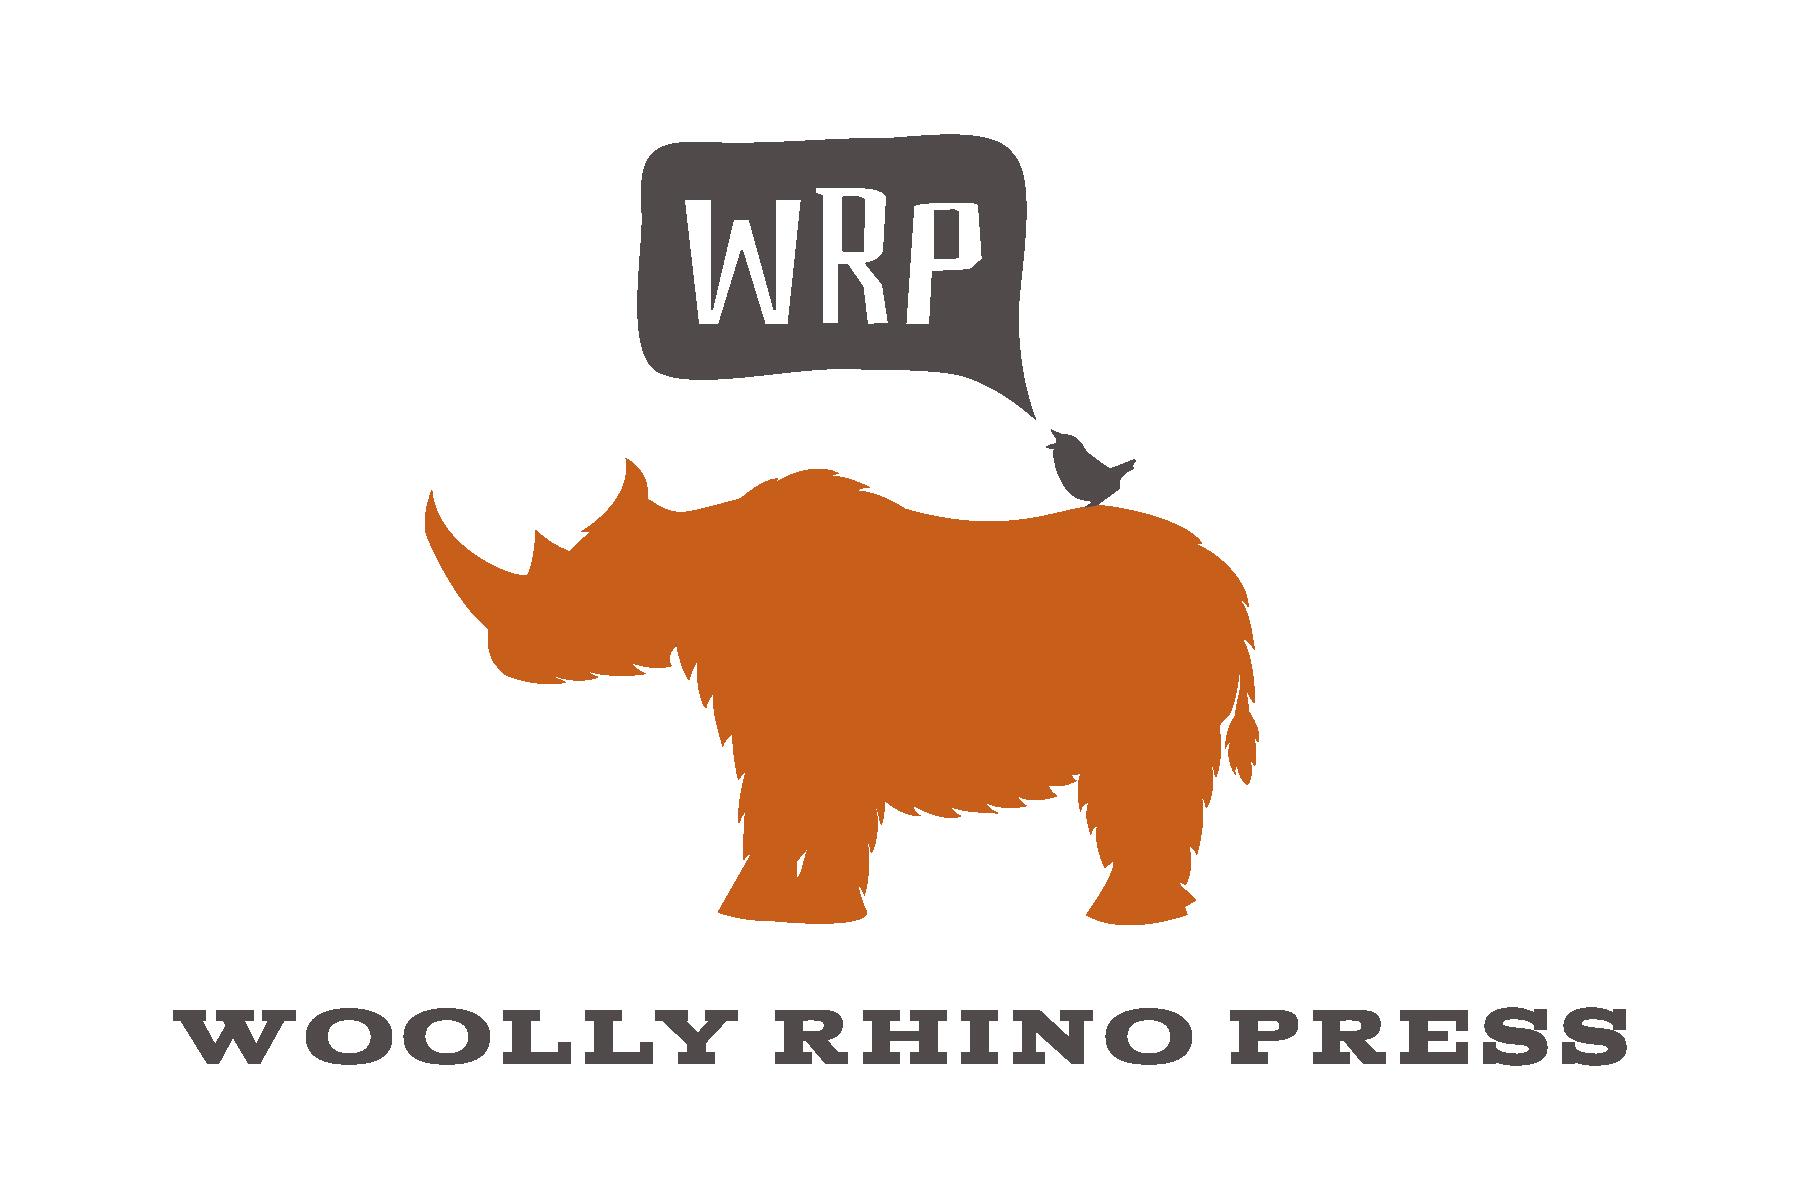 woollyrhinopress.png